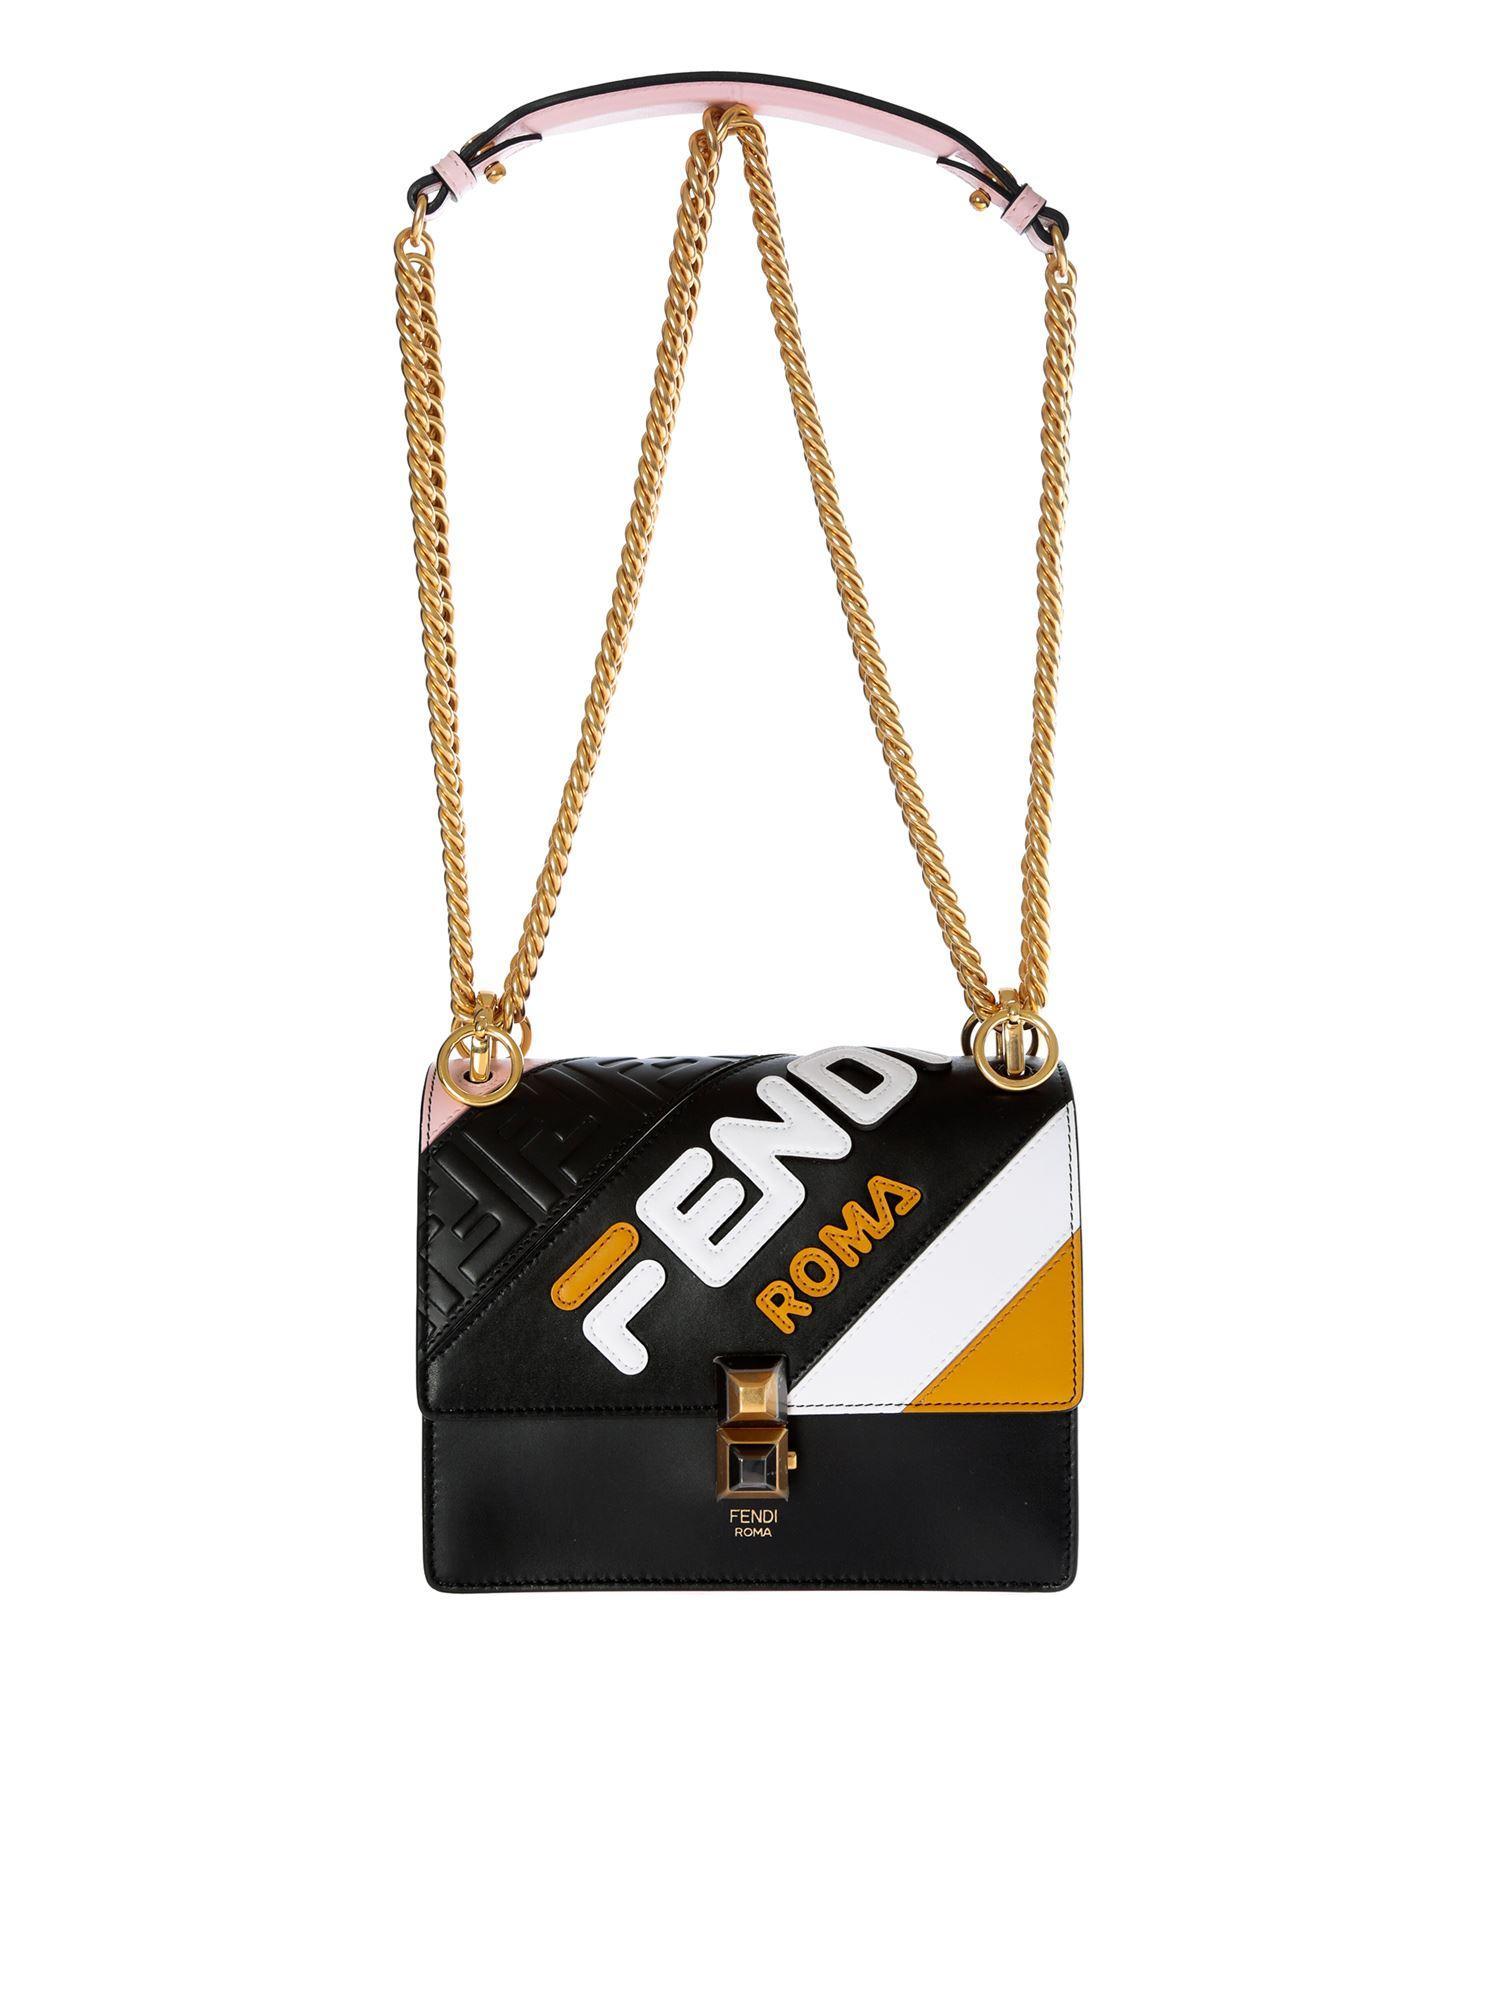 2e7526467b75 Fendi Kan I Small Black Bag in Black - Save 19% - Lyst